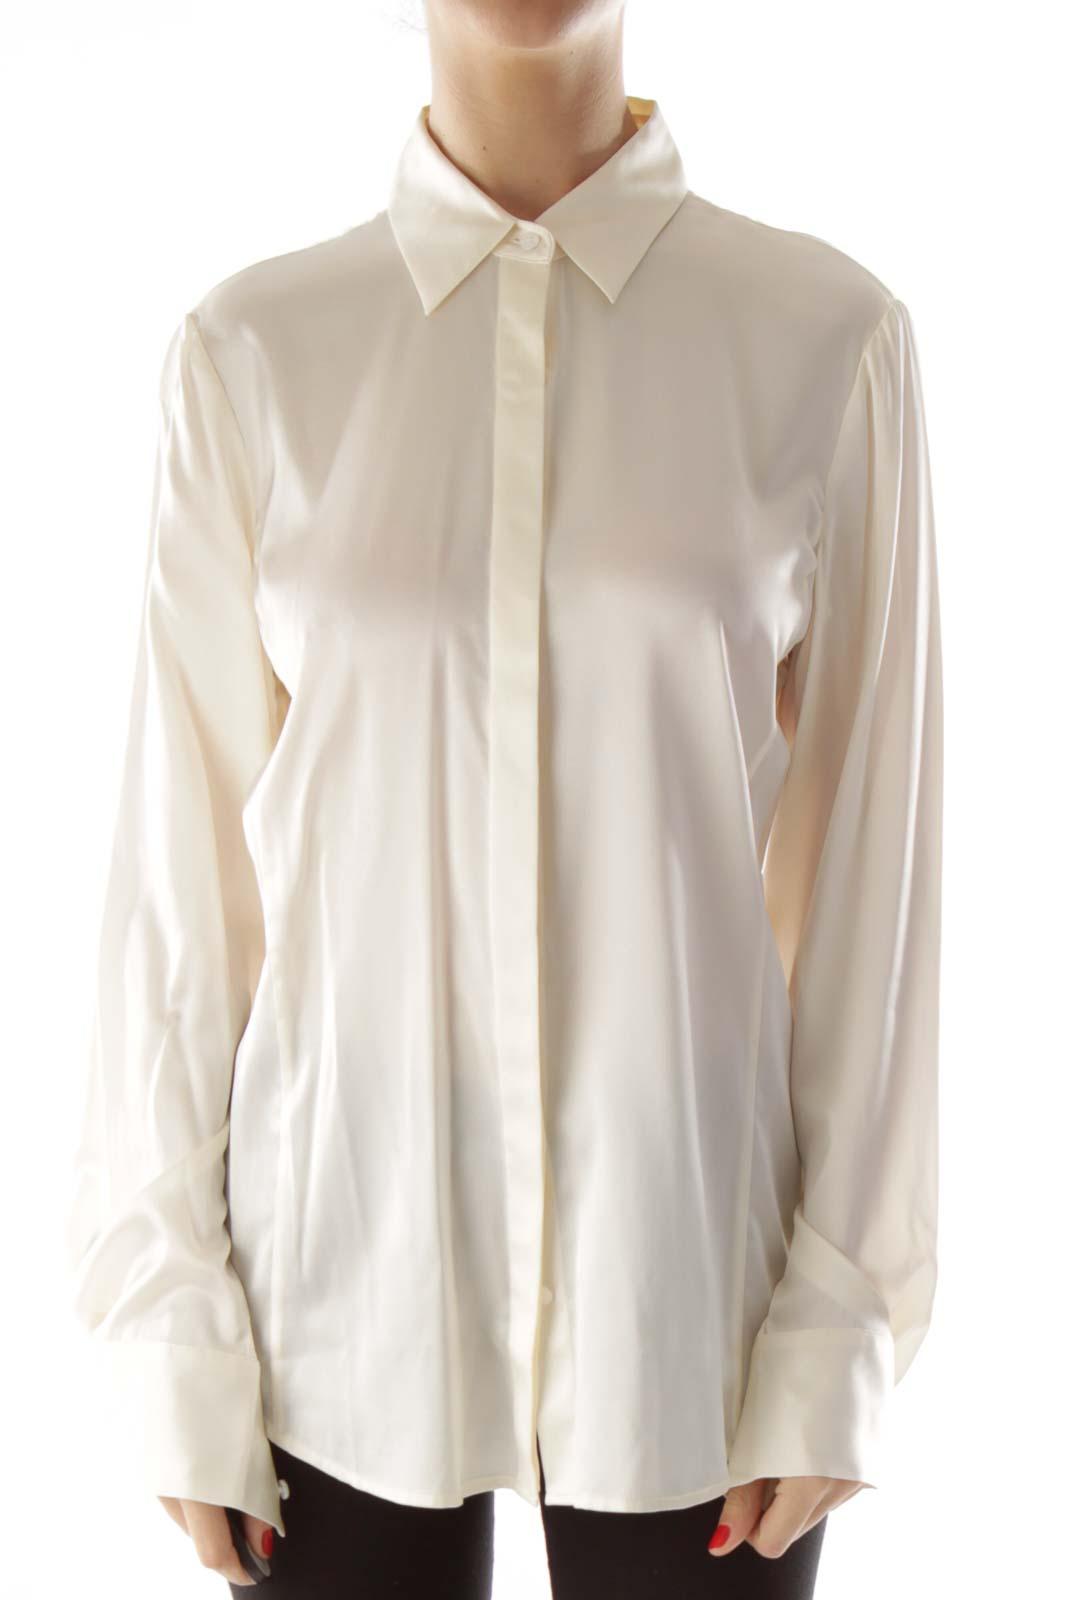 Cream Silk Buttoned Up